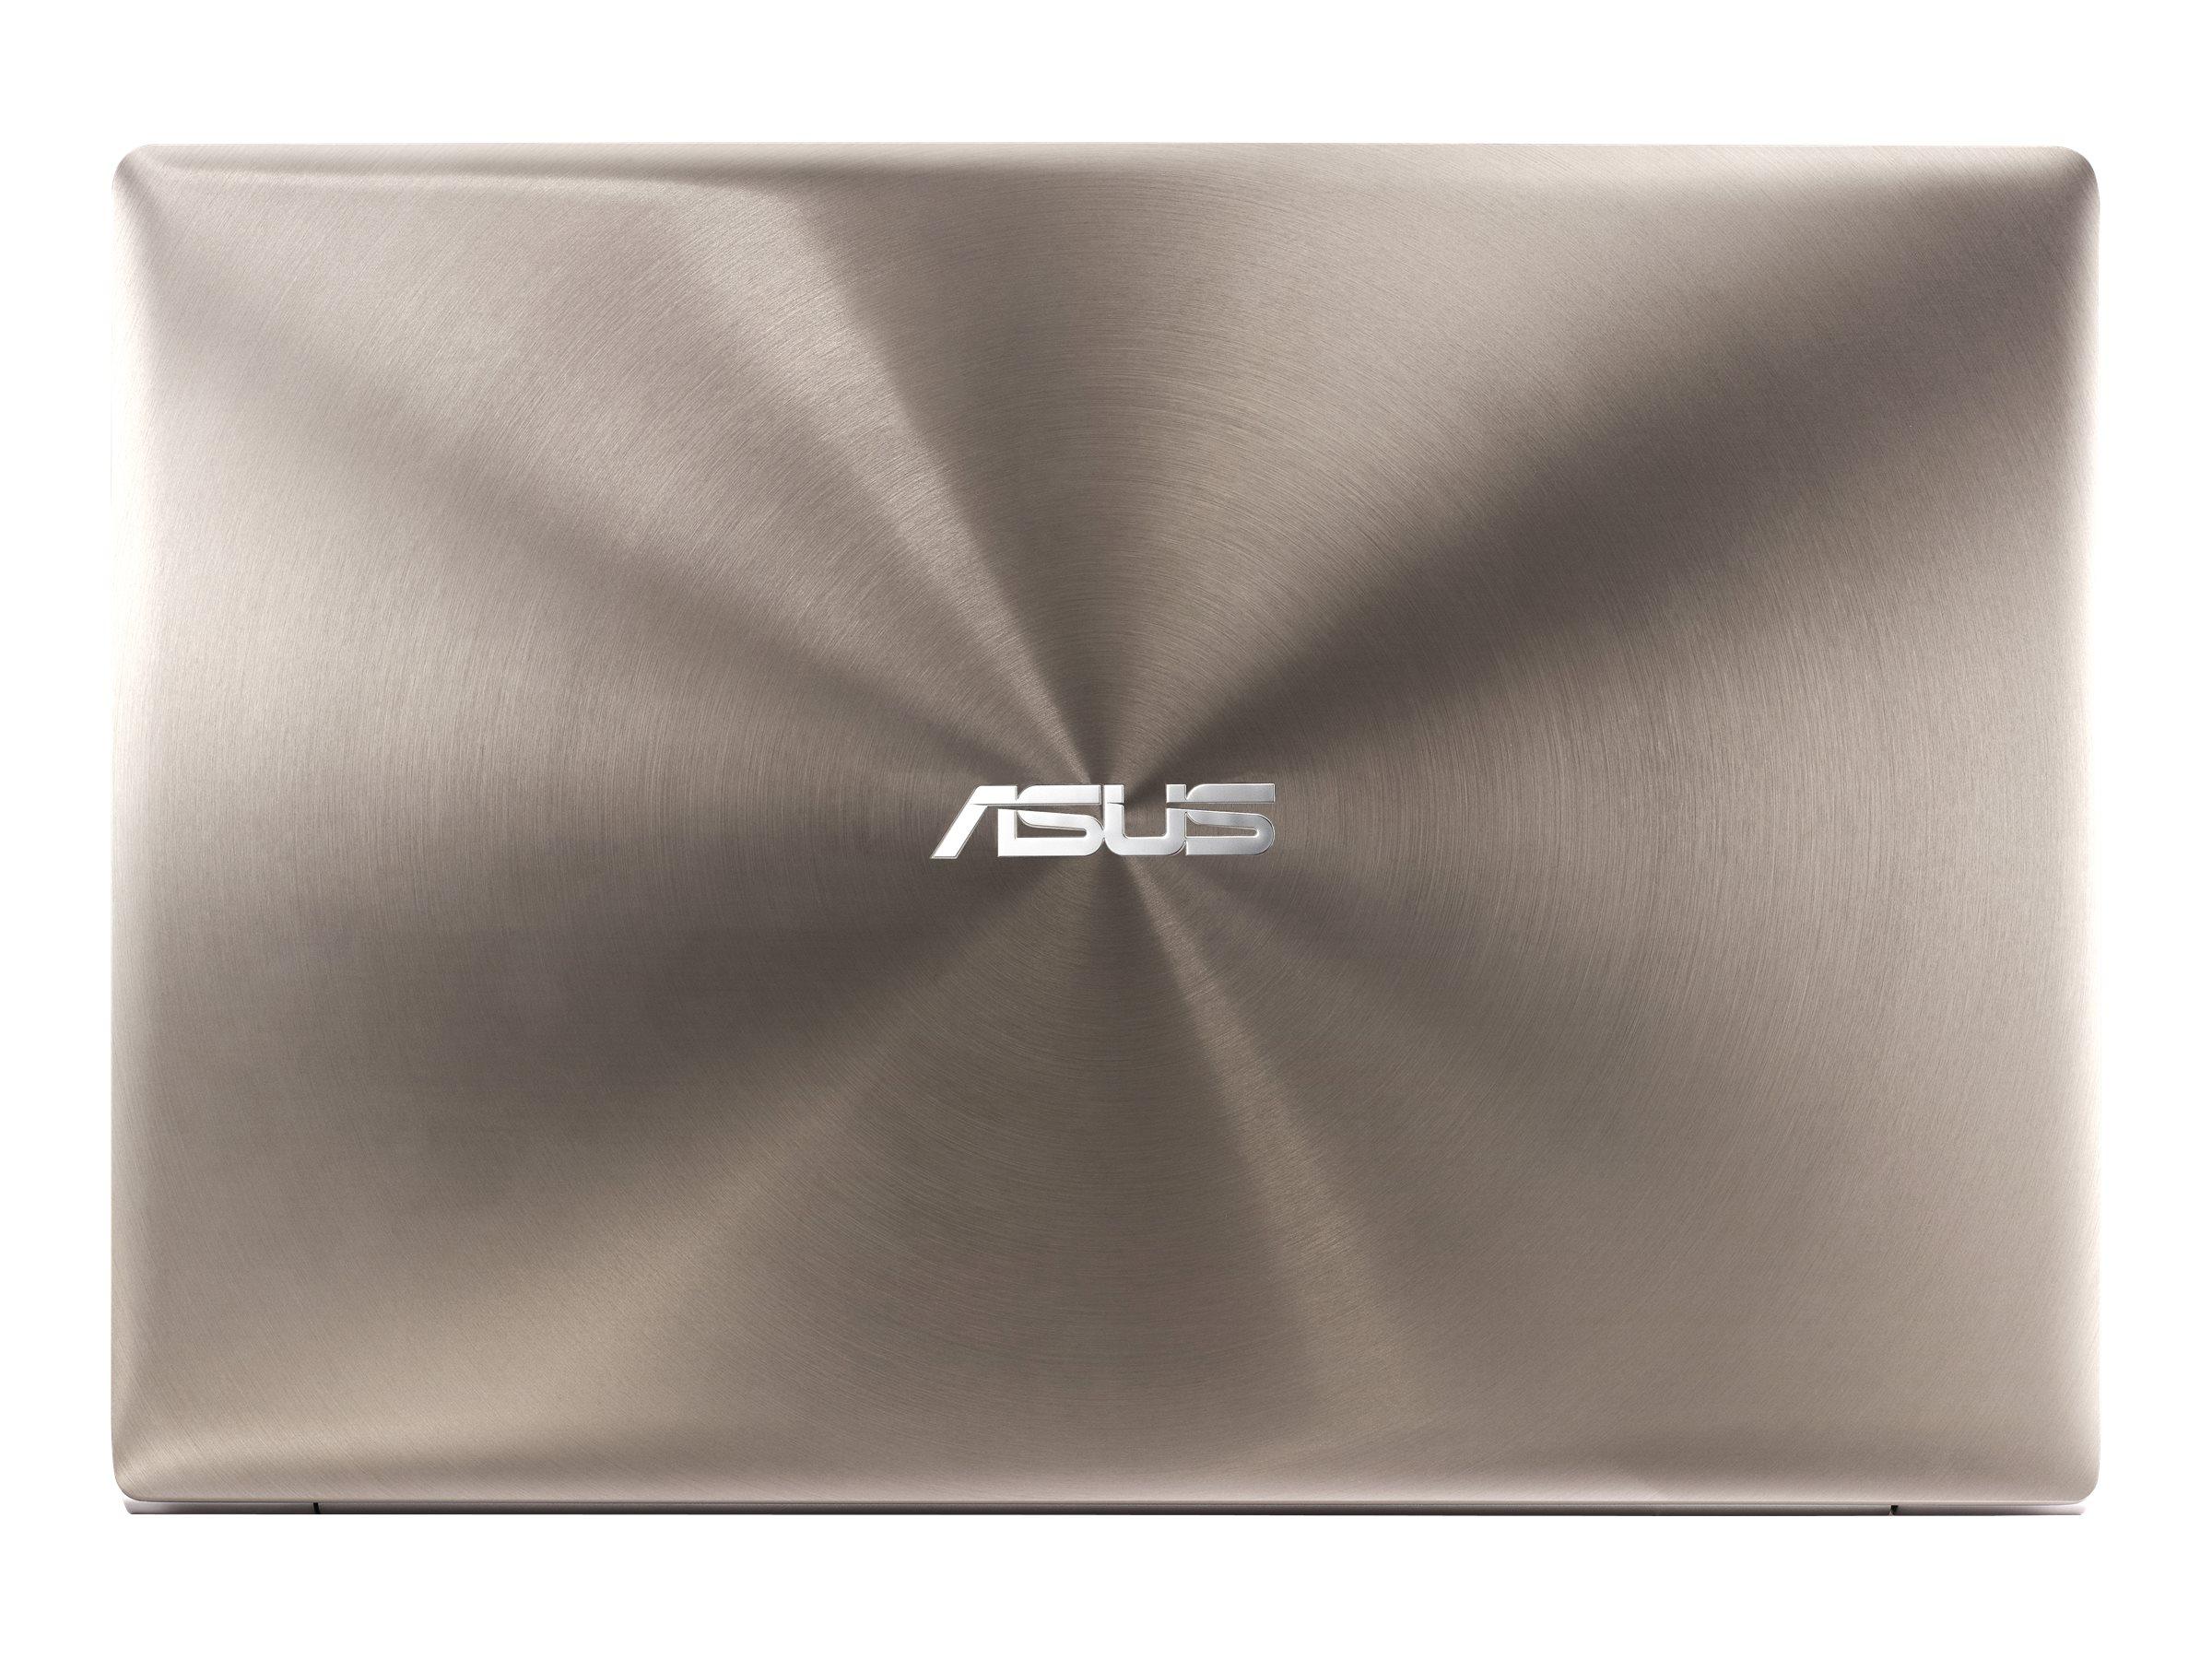 Asus UX303UB-DH74T Image 9